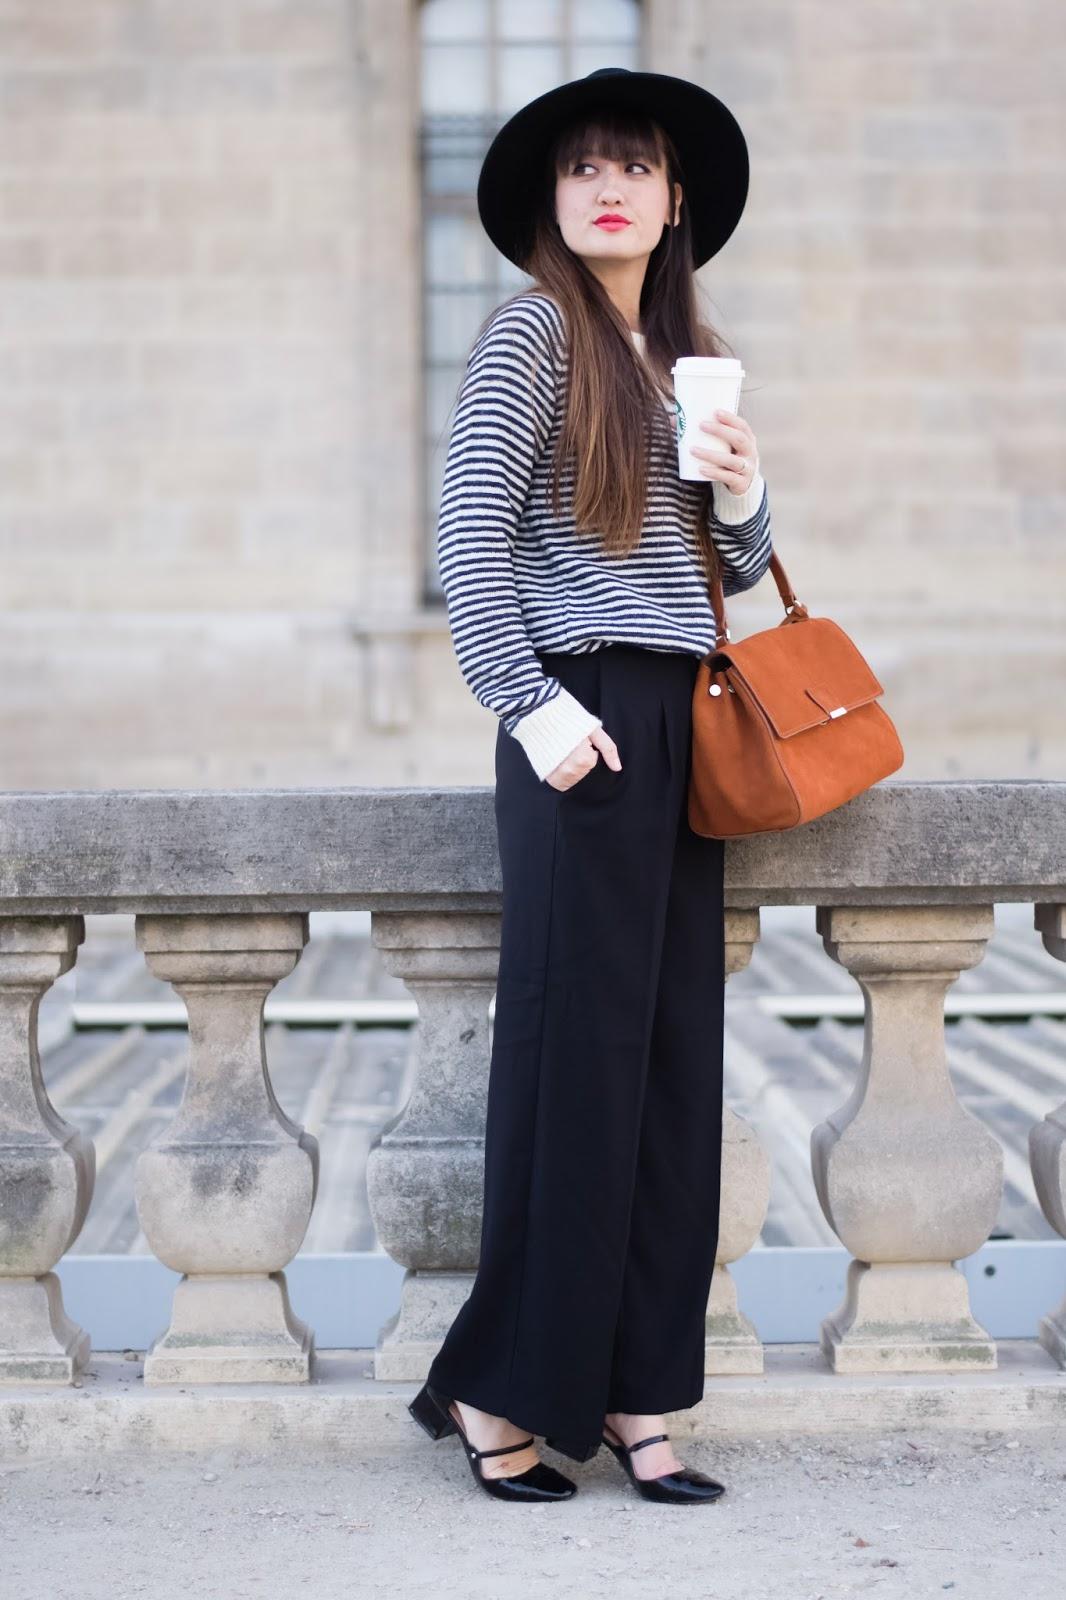 Parisian fashion blogger, look, style, mode, chic Parisian style, Nikita Wong, street style